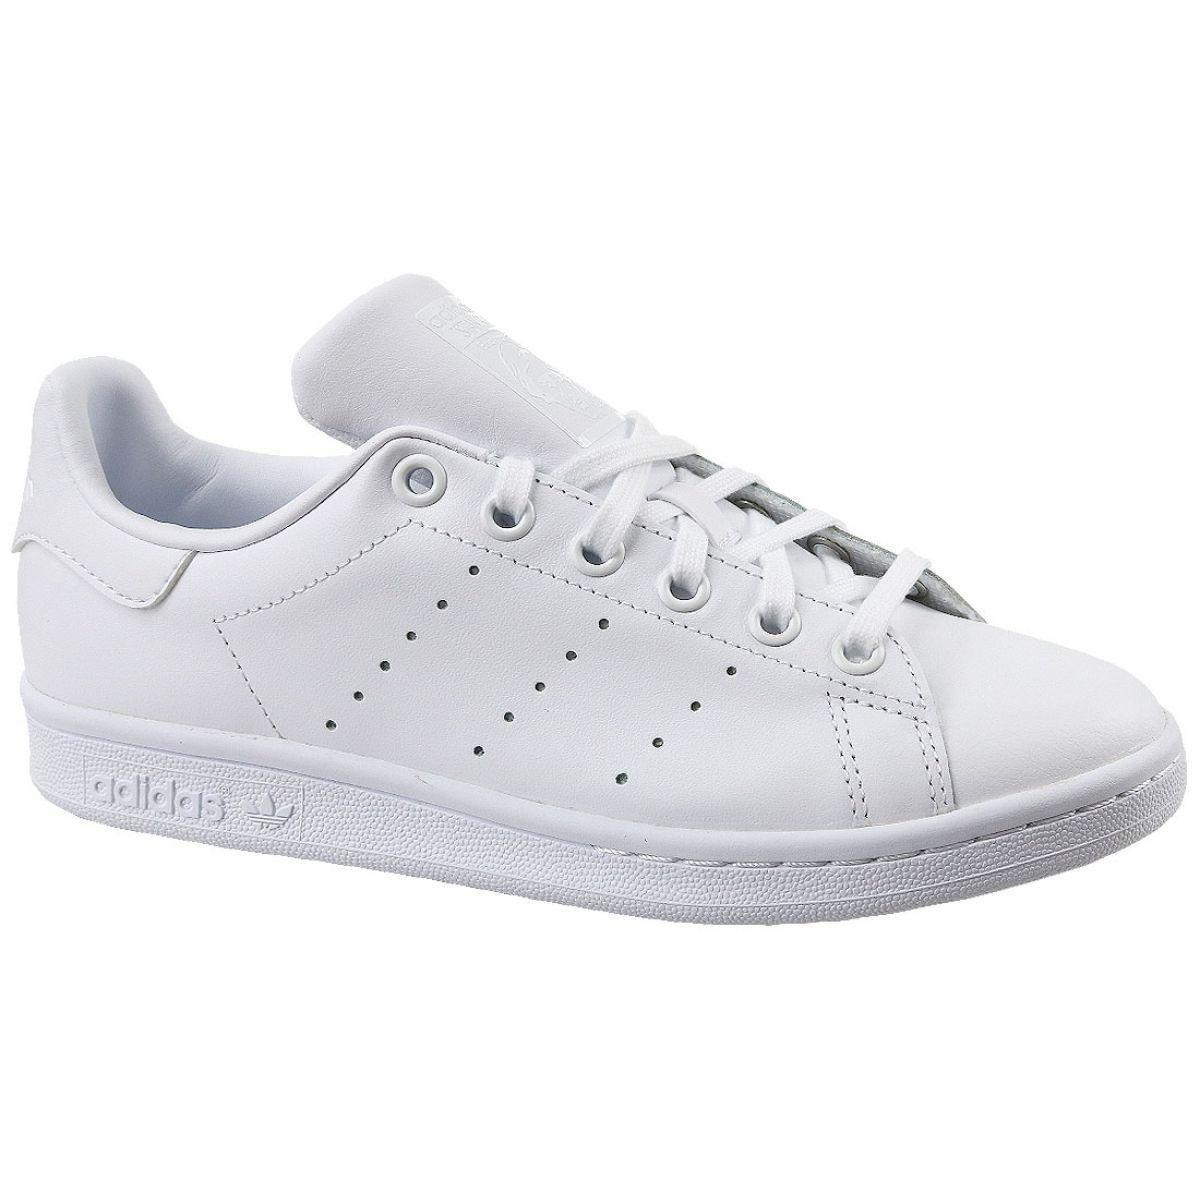 Adidas Stan Smith Jr S76330 shoes white